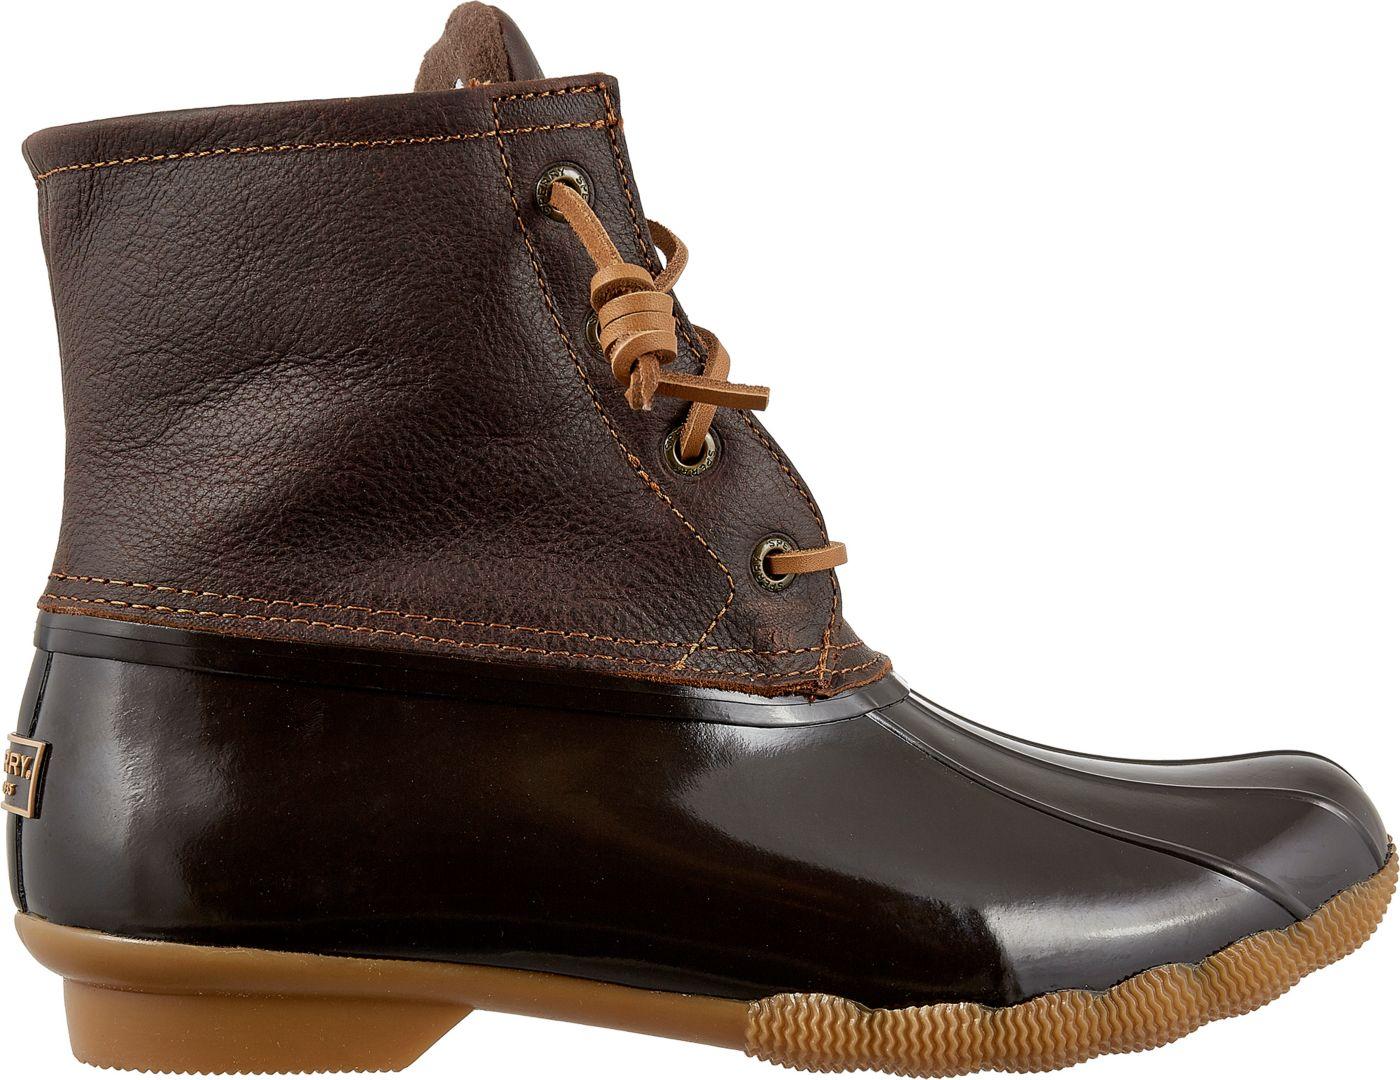 Sperry Women's Saltwater Leather Waterproof Winter Boots